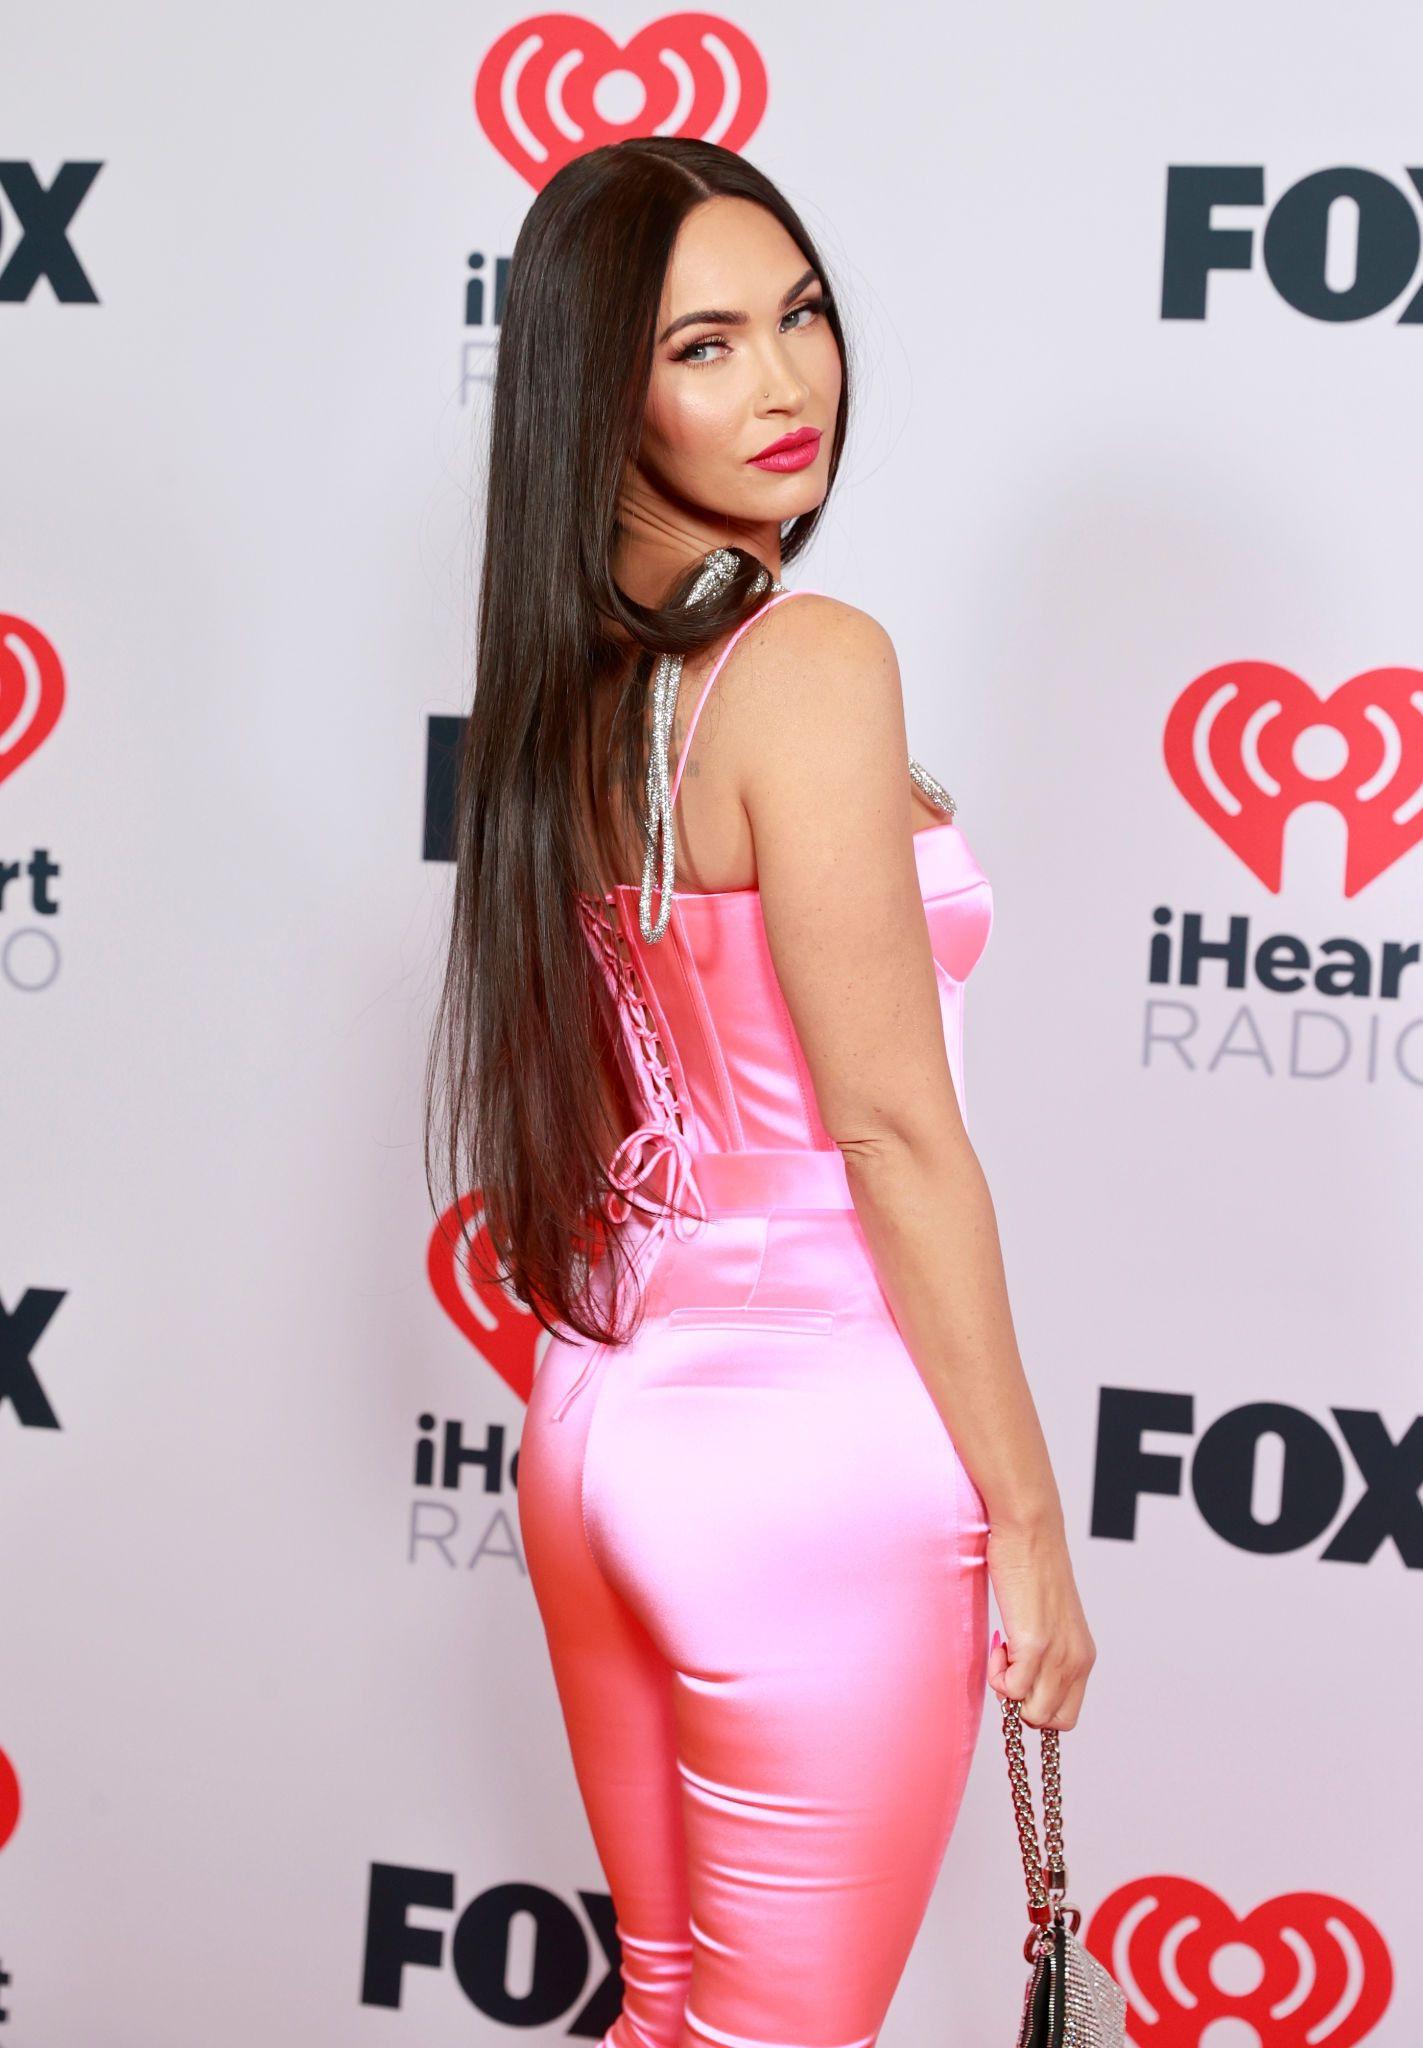 Megan Fox Big Cleavage